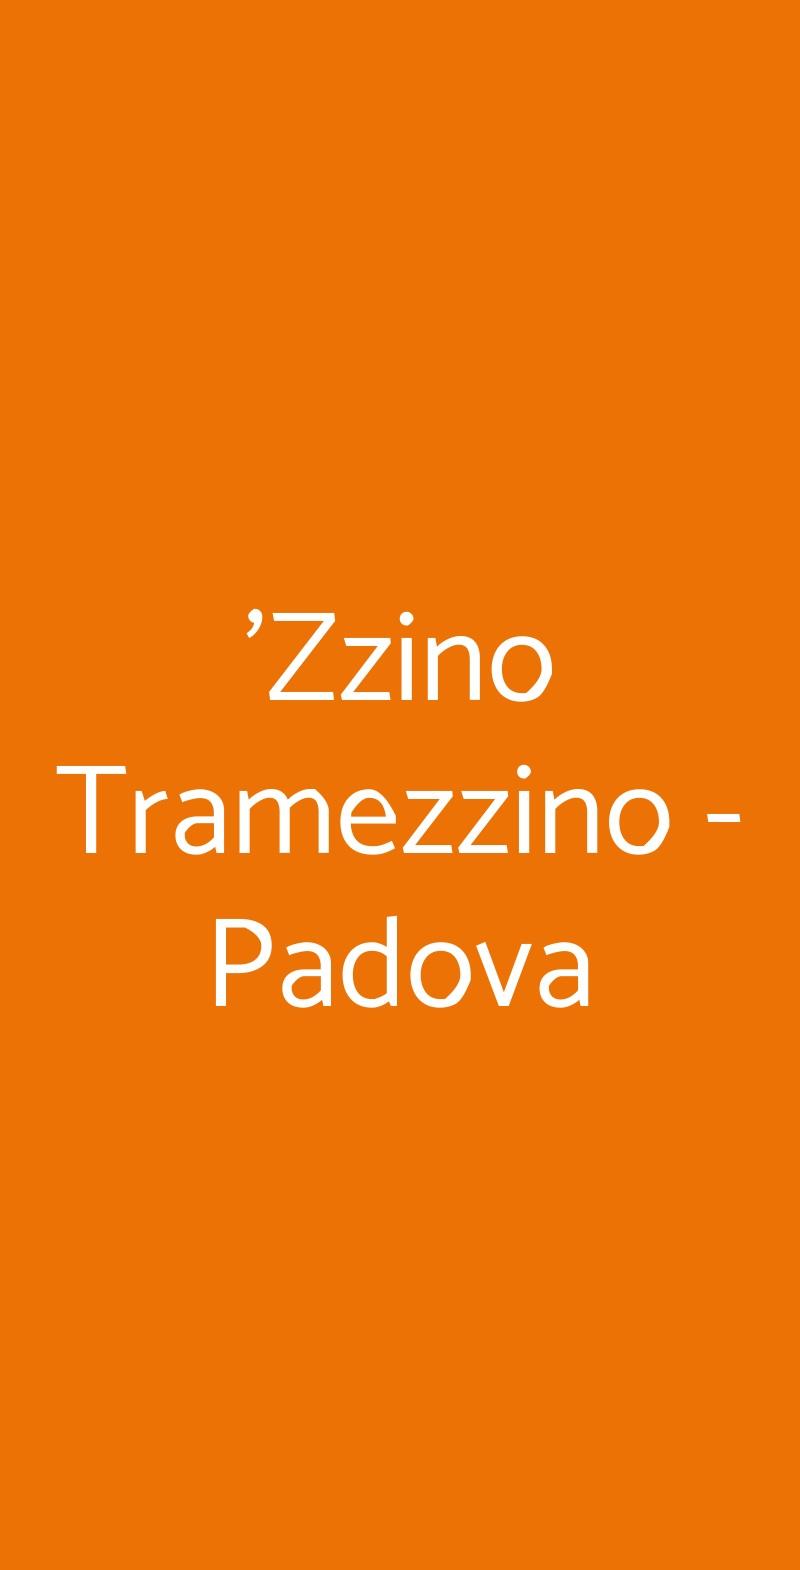 'Zzino Tramezzino - Padova Padova menù 1 pagina